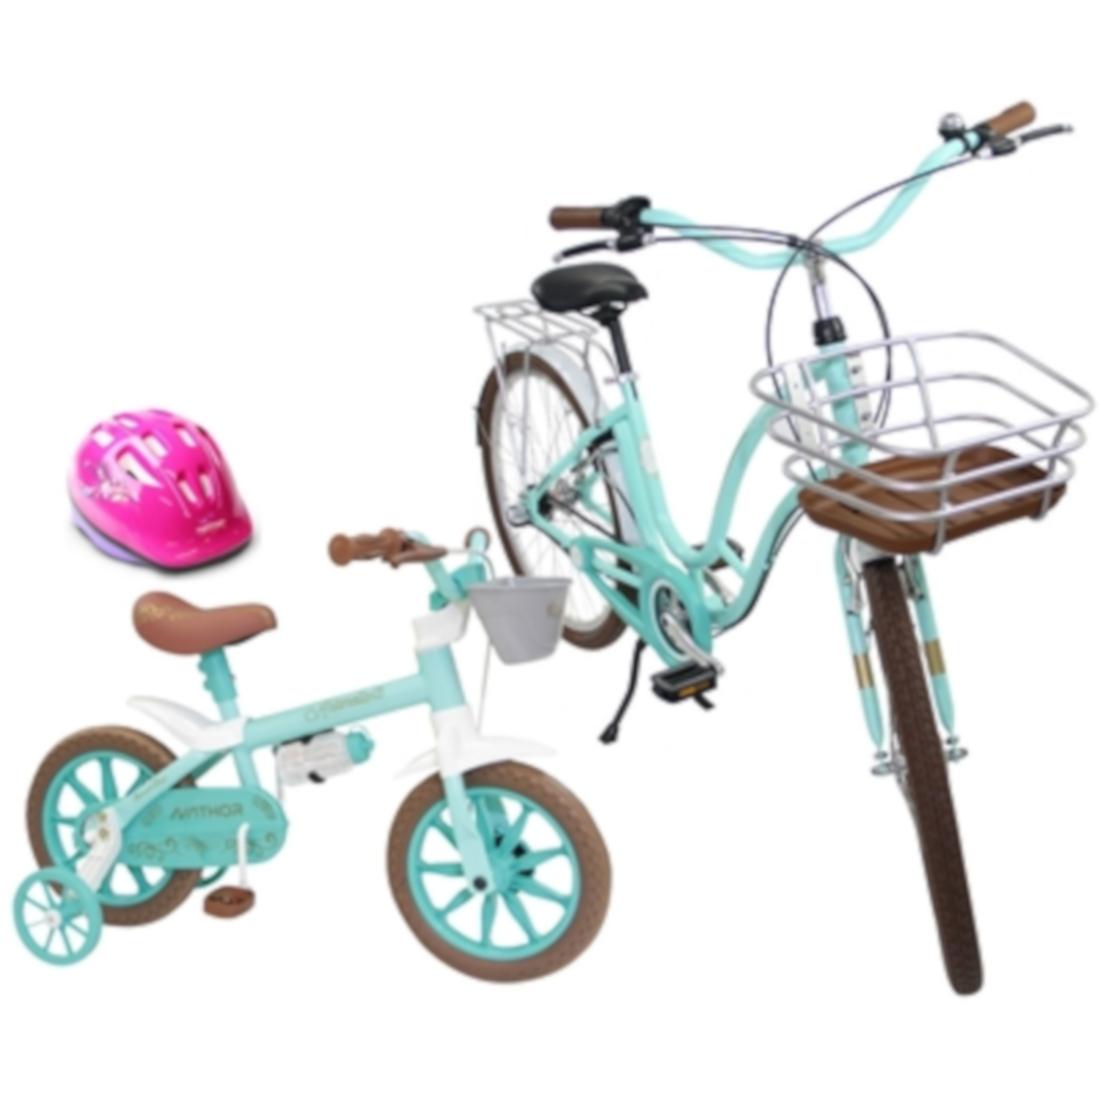 Bicicleta Retrô Antonella Aro 26 e Aro 12 com Capacete Kit Mãe e Filha